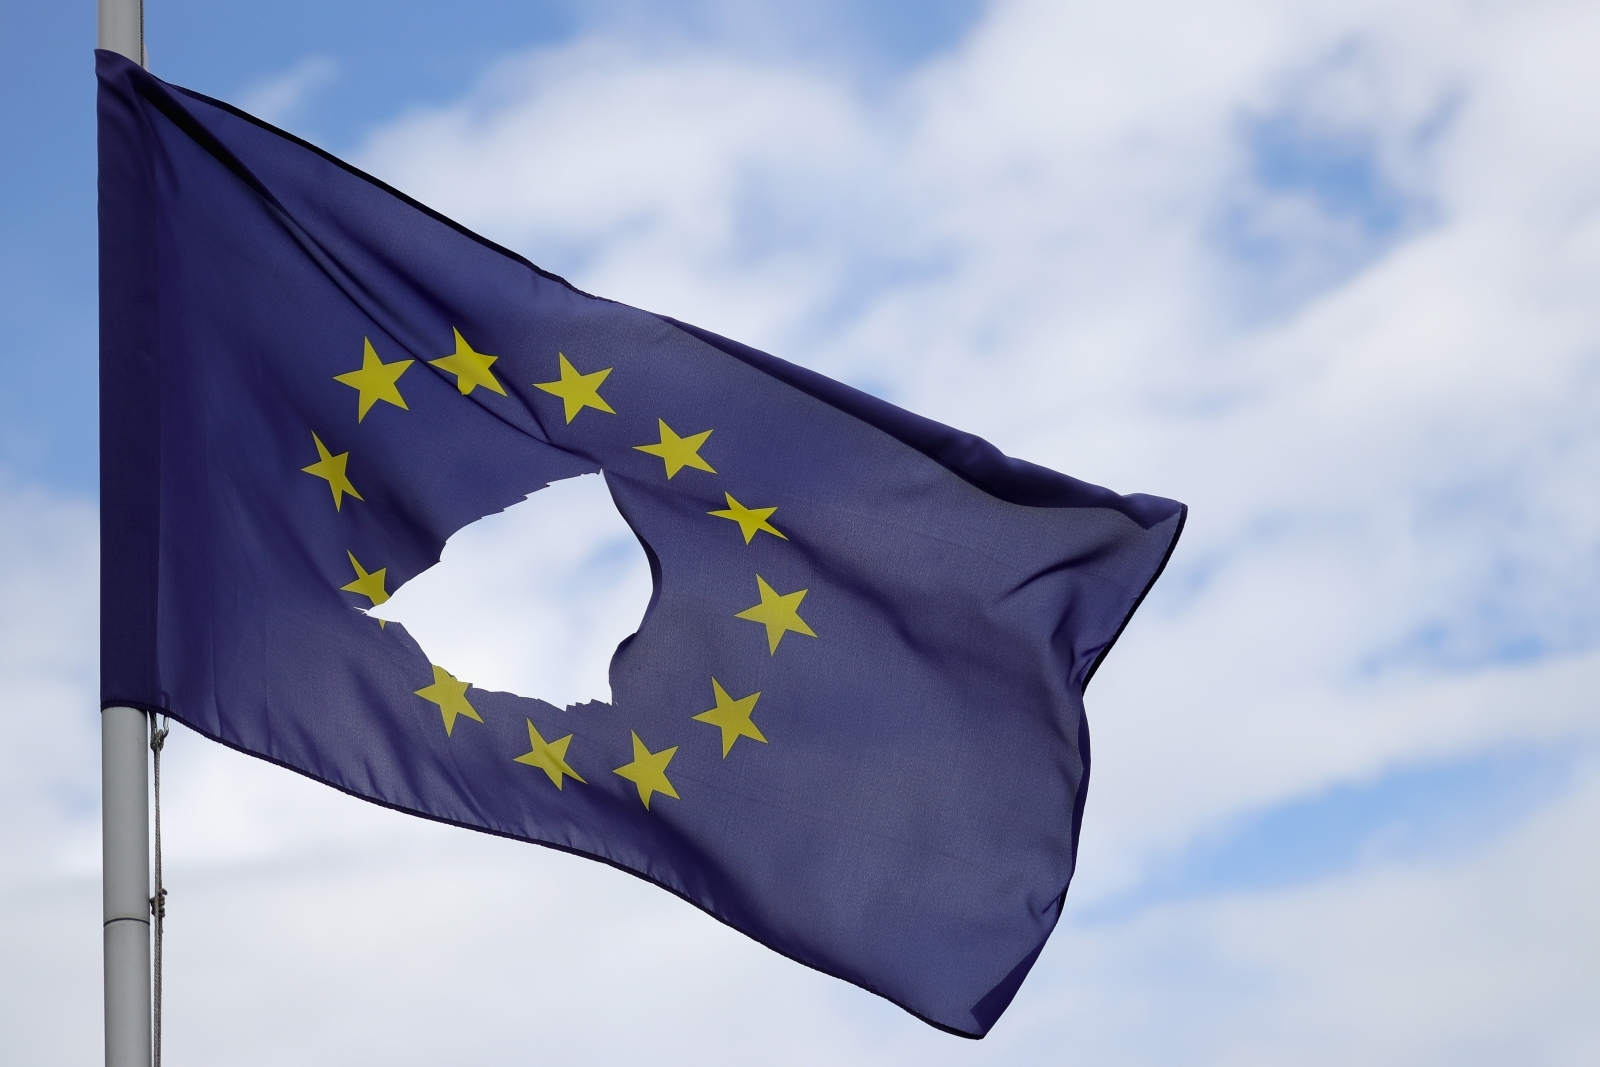 Torn EU flag